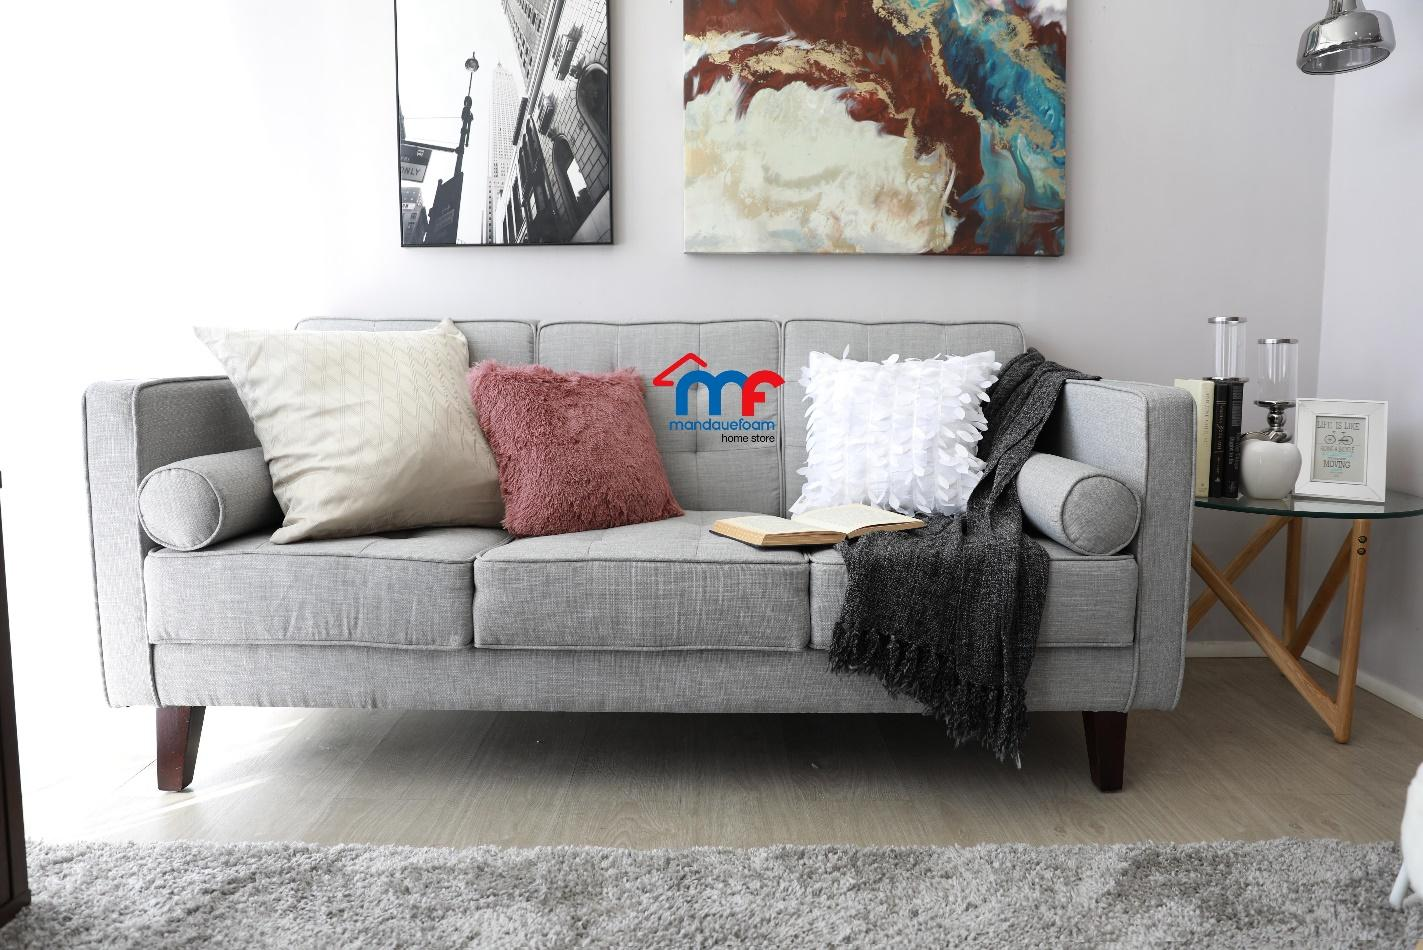 Peachy 7 Tips To Design A Tiny Yet Chic Living Room Lamudi Evergreenethics Interior Chair Design Evergreenethicsorg